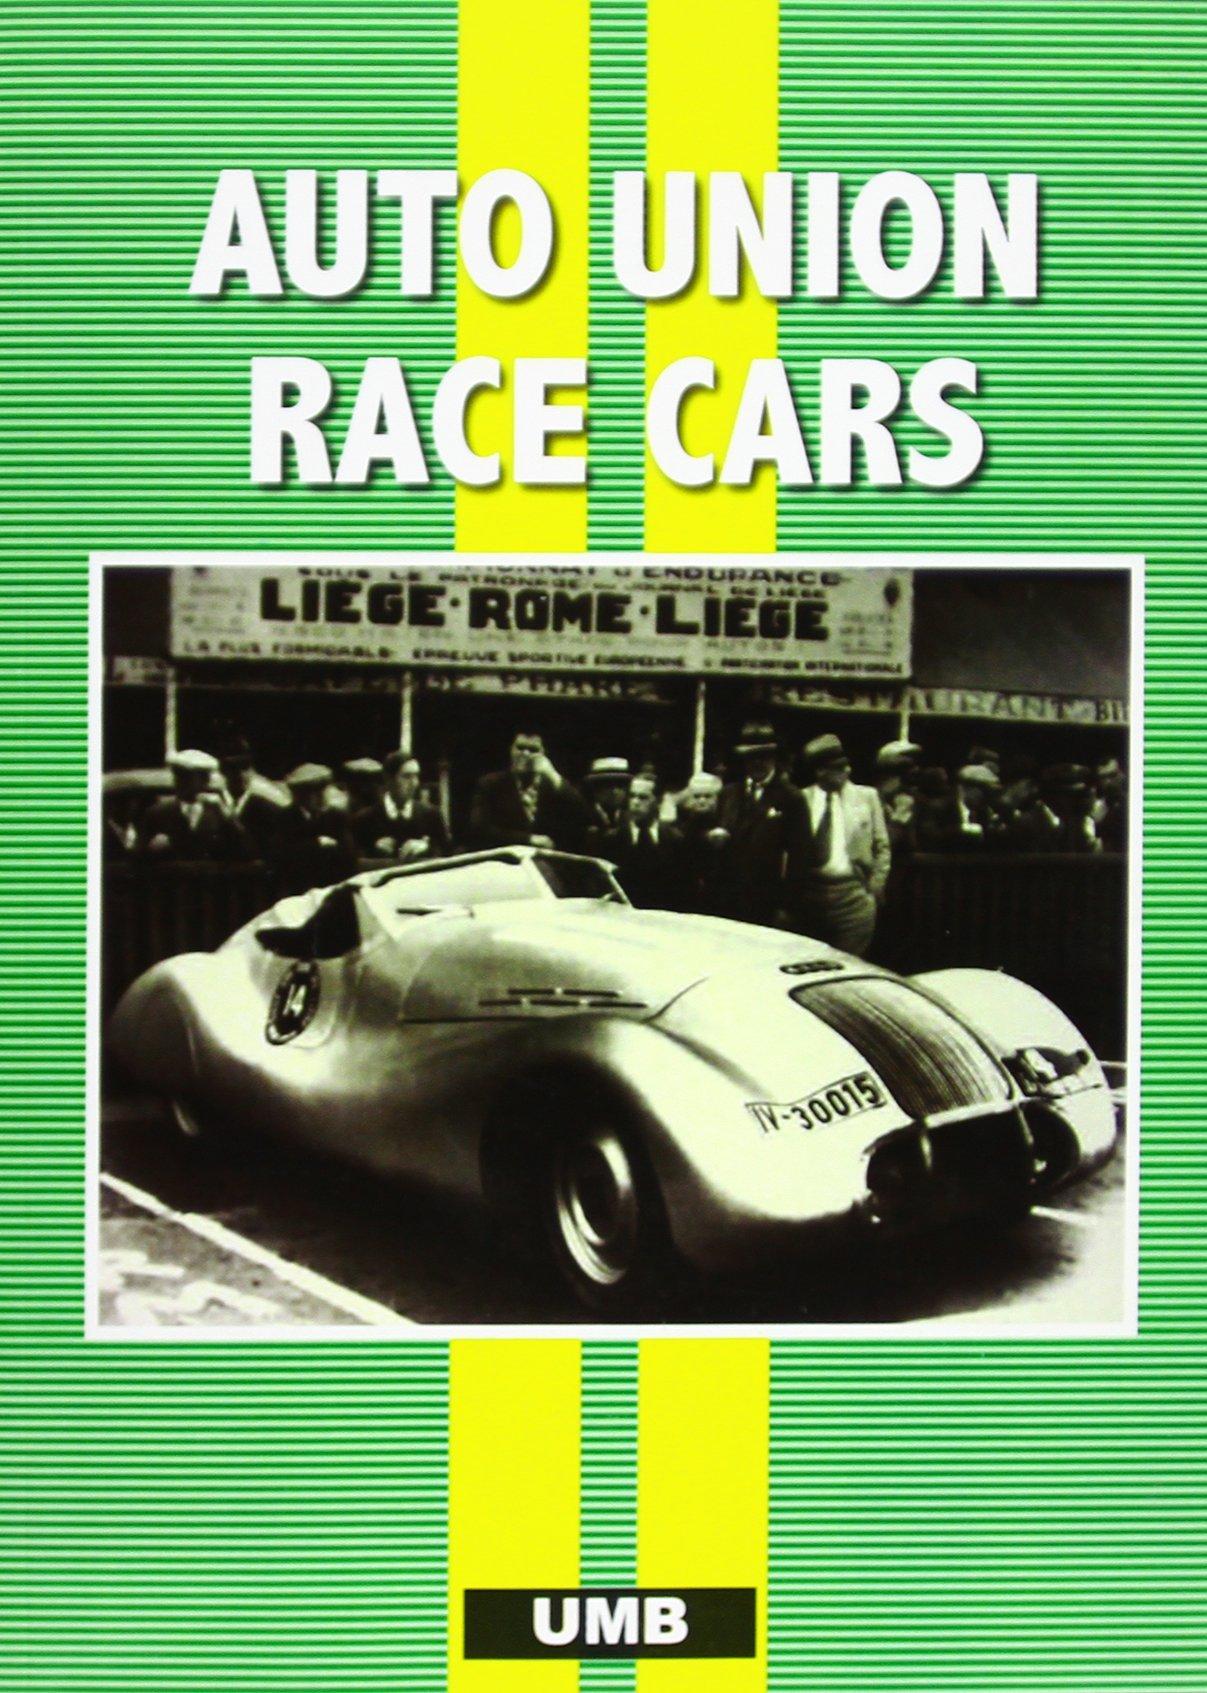 Auto-Union Racing Cars